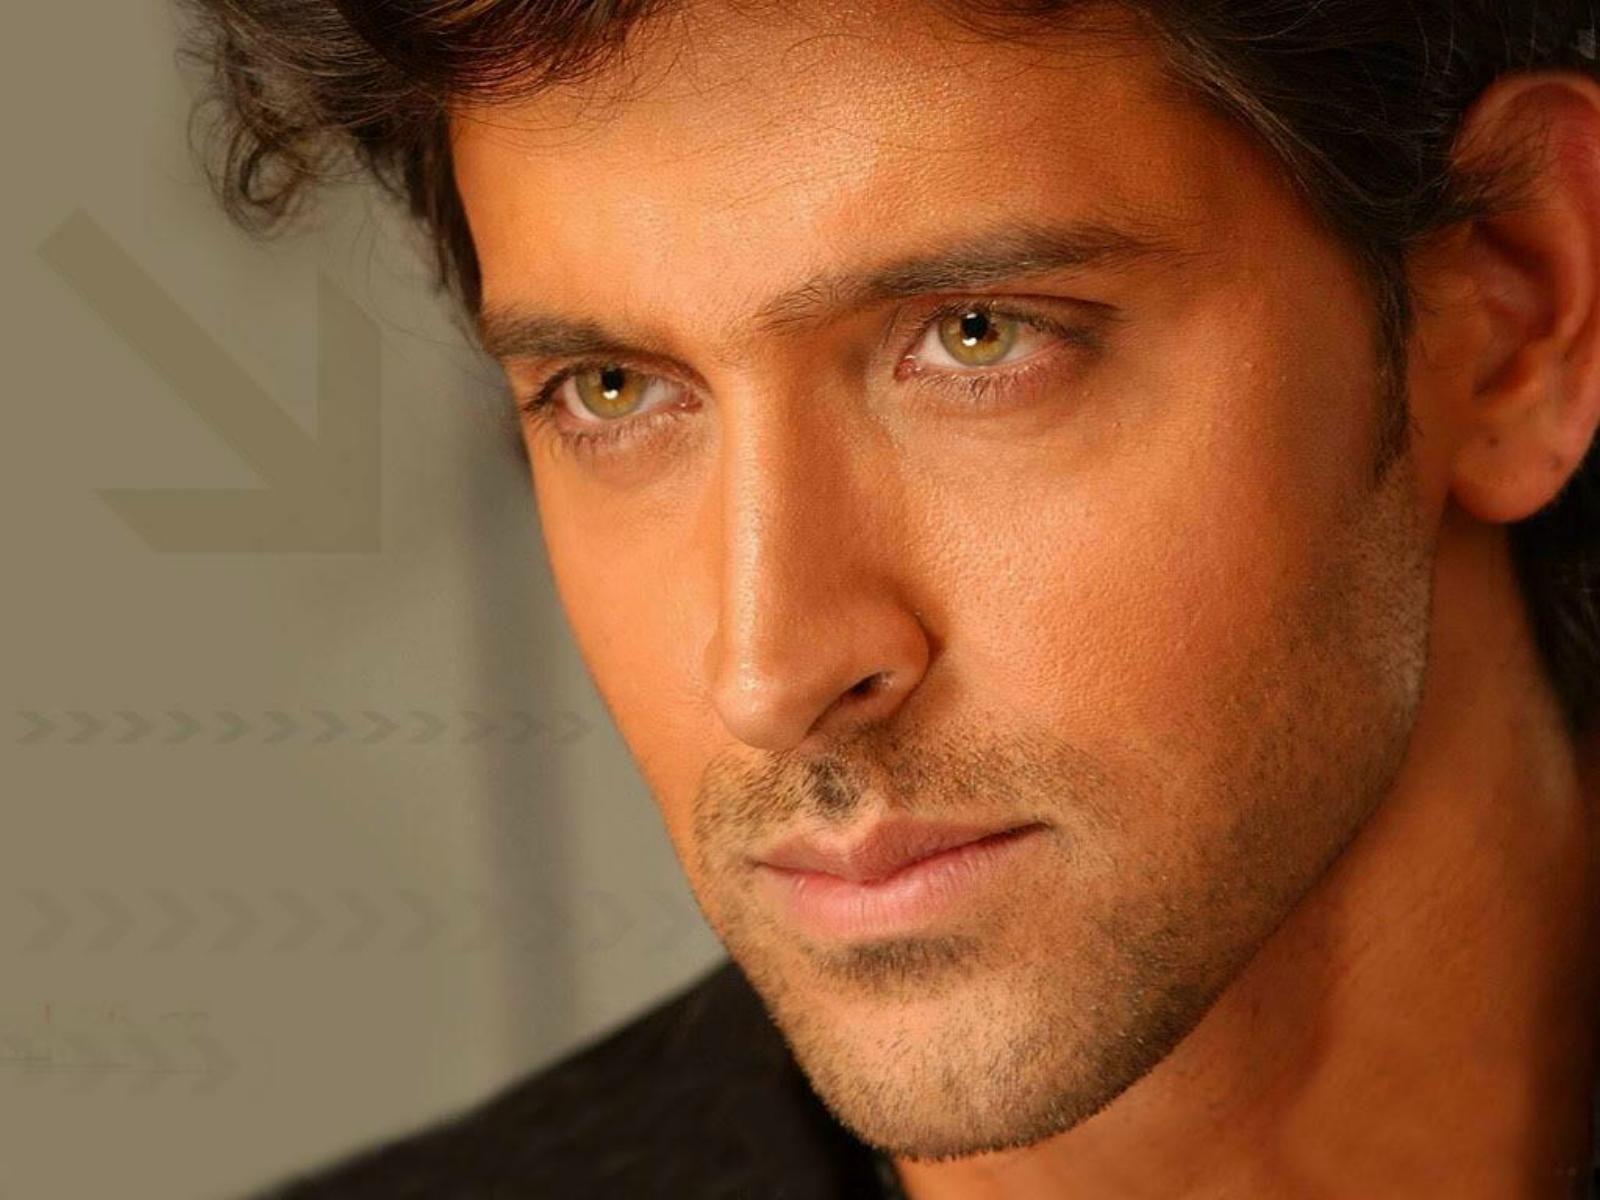 Hrithik Roshan, Indian actor.